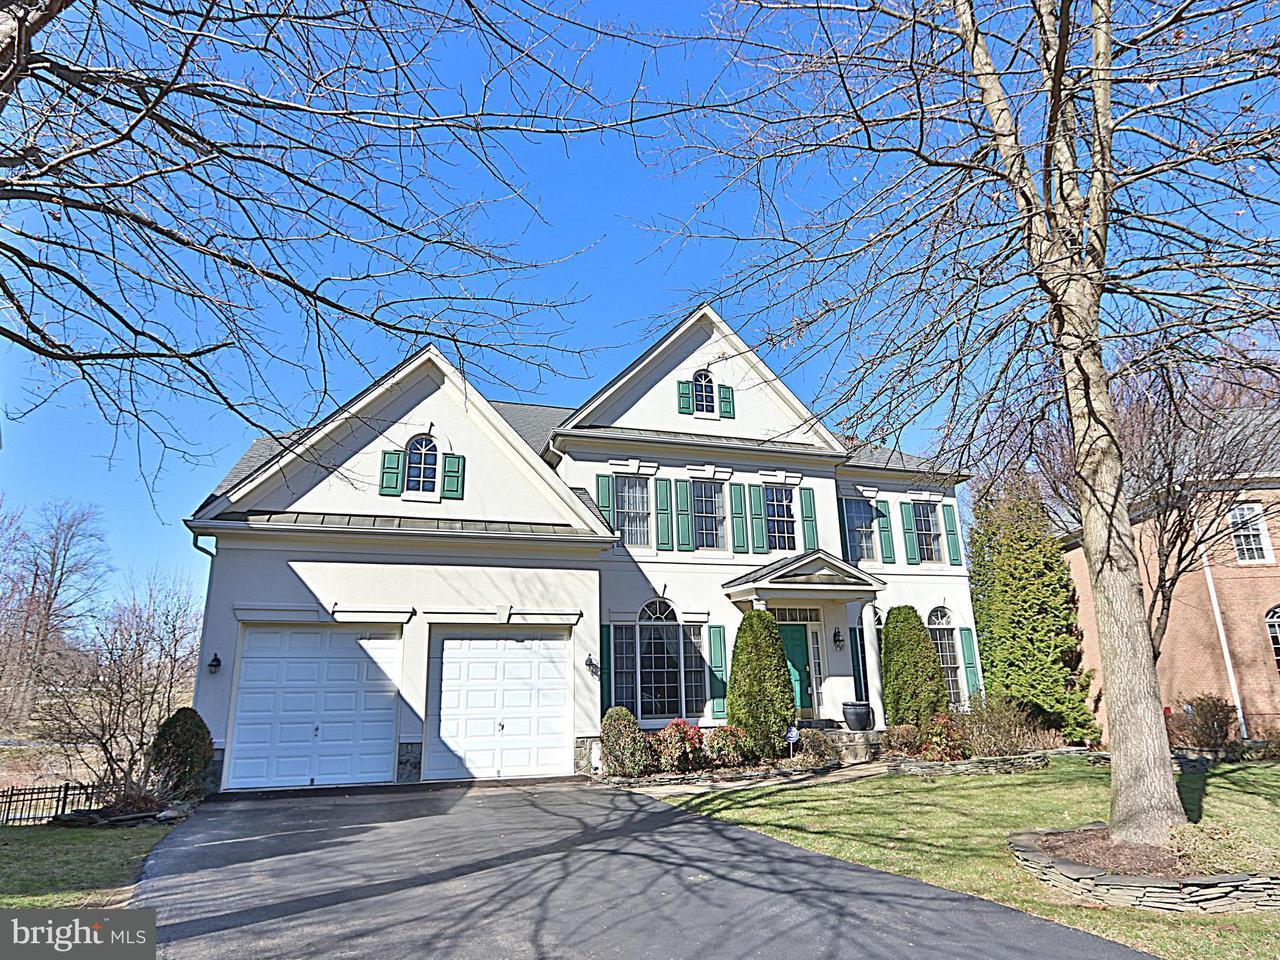 Single Family Home for Sale at 10112 Daniels Run Way 10112 Daniels Run Way Fairfax, Virginia 22030 United States